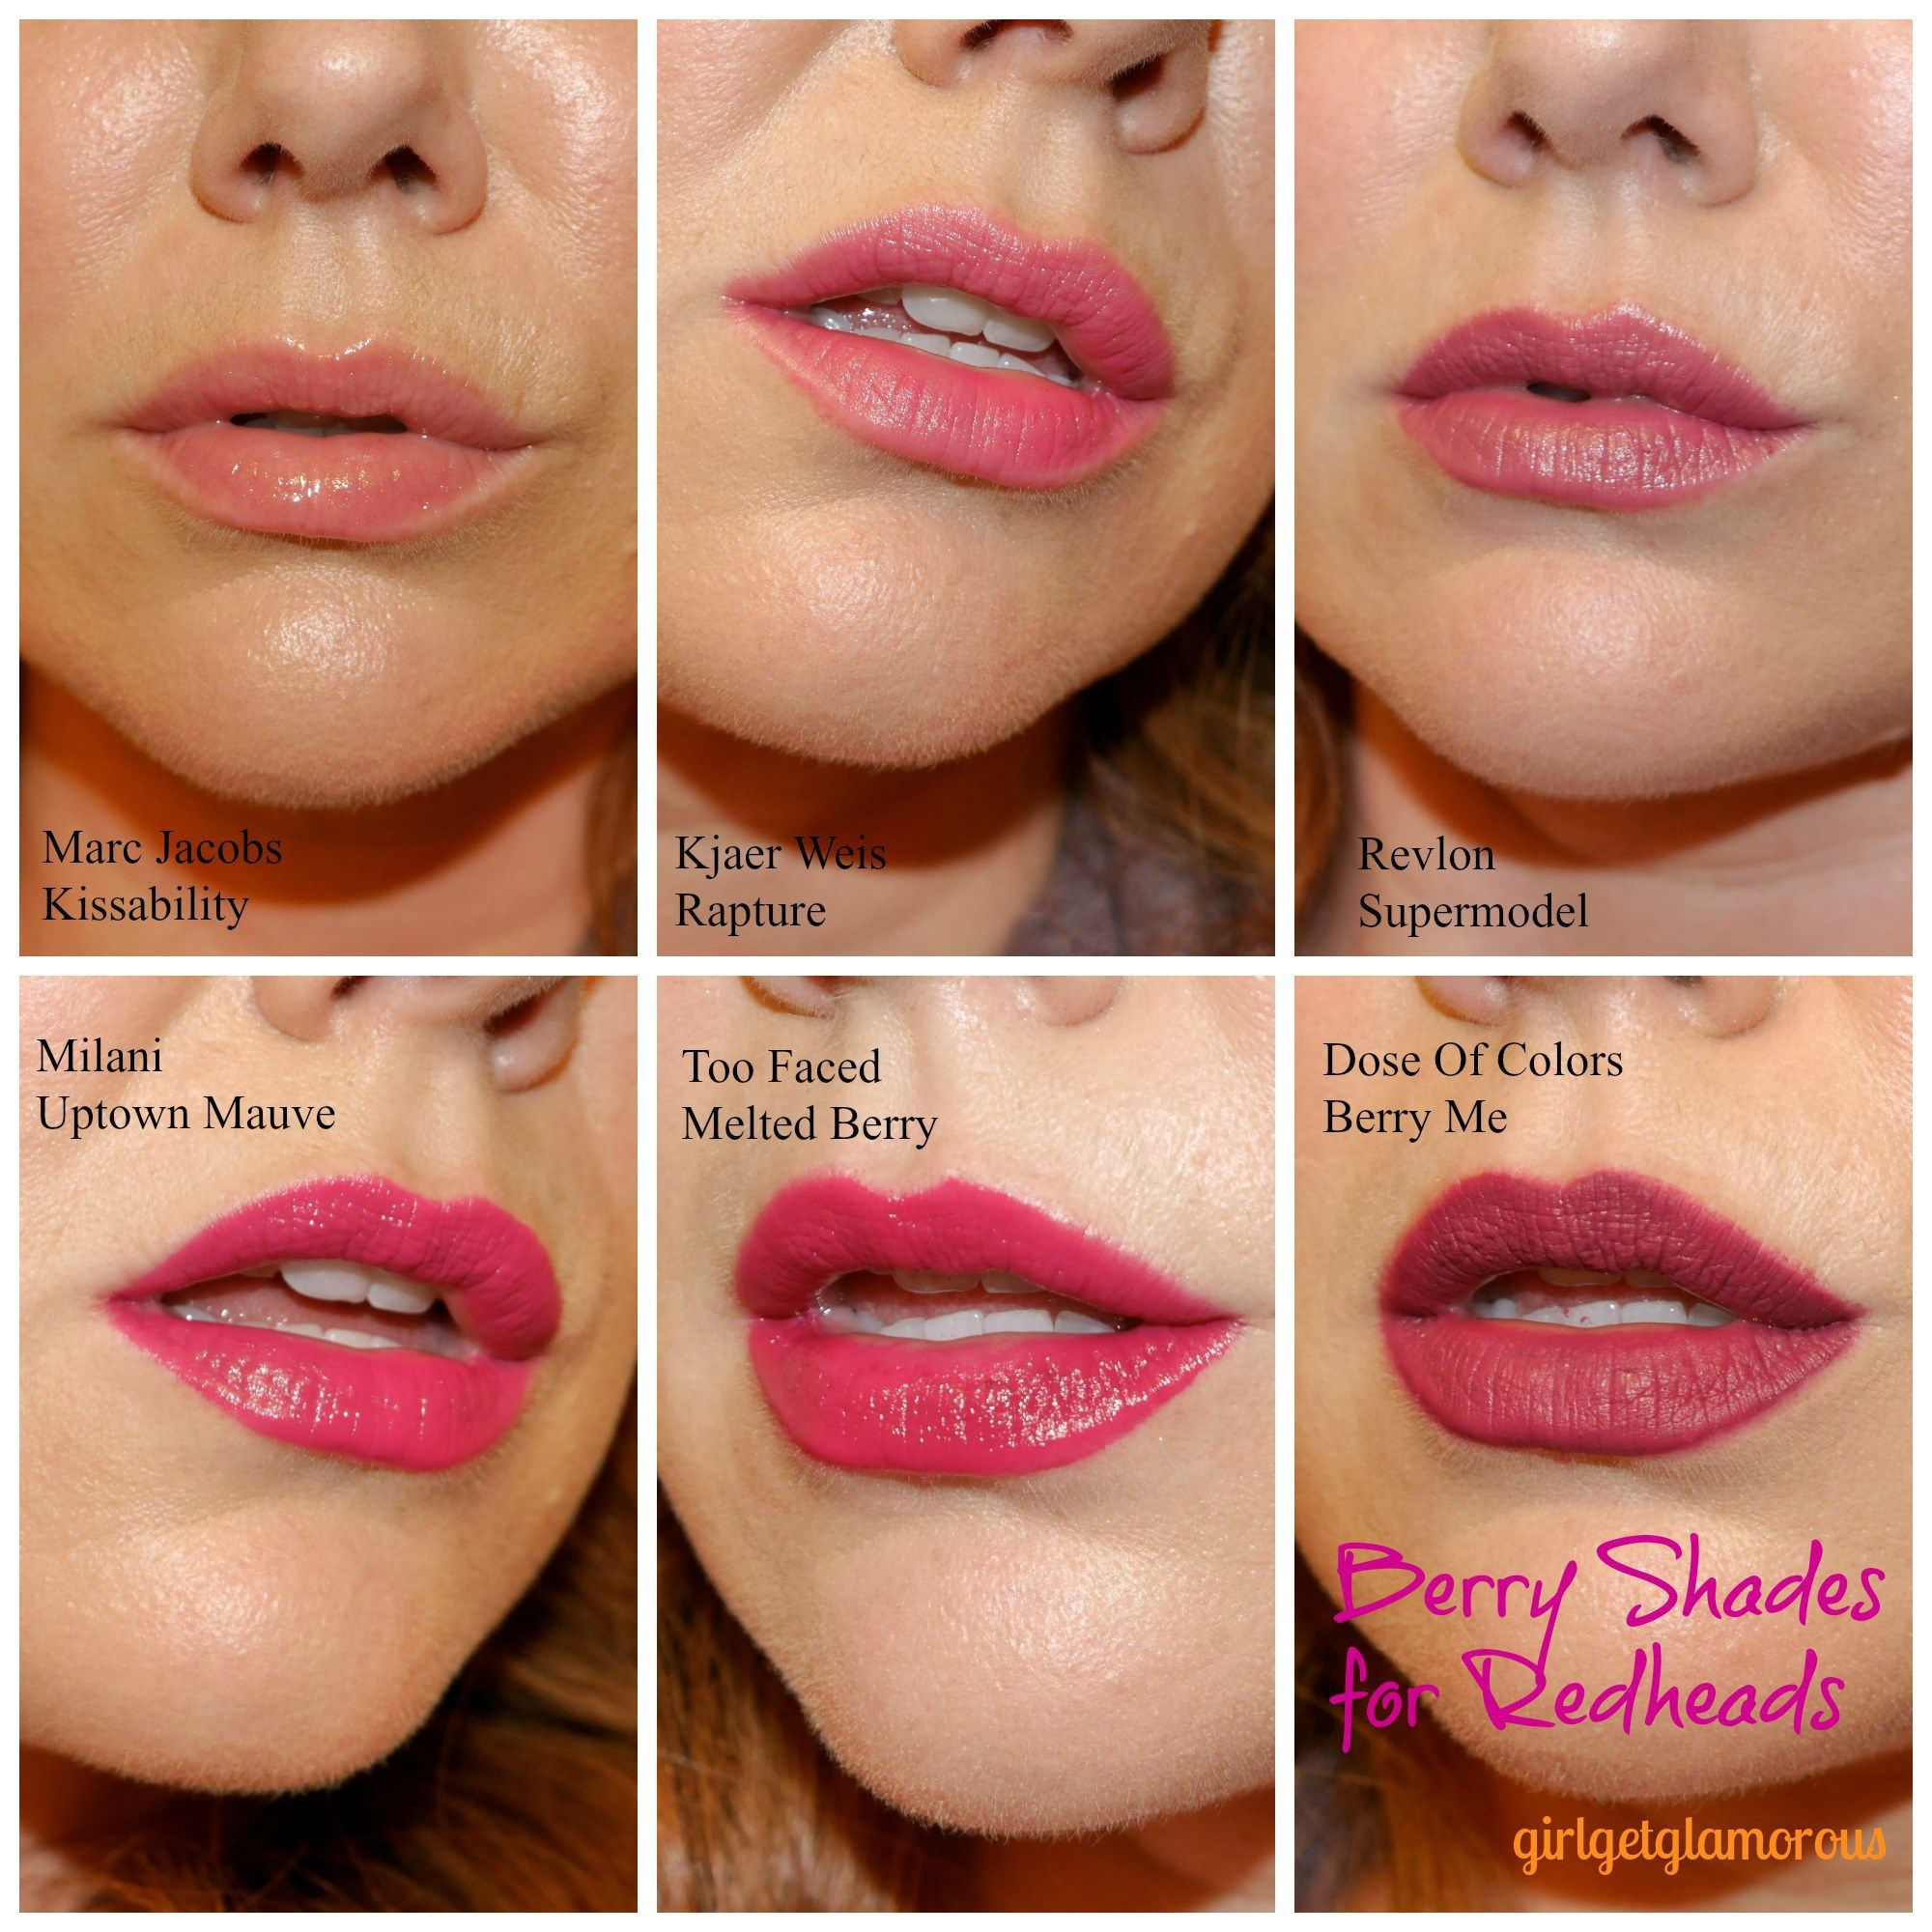 The Best Berry Lipsticks For Fair Skin Redheads Fair Skin